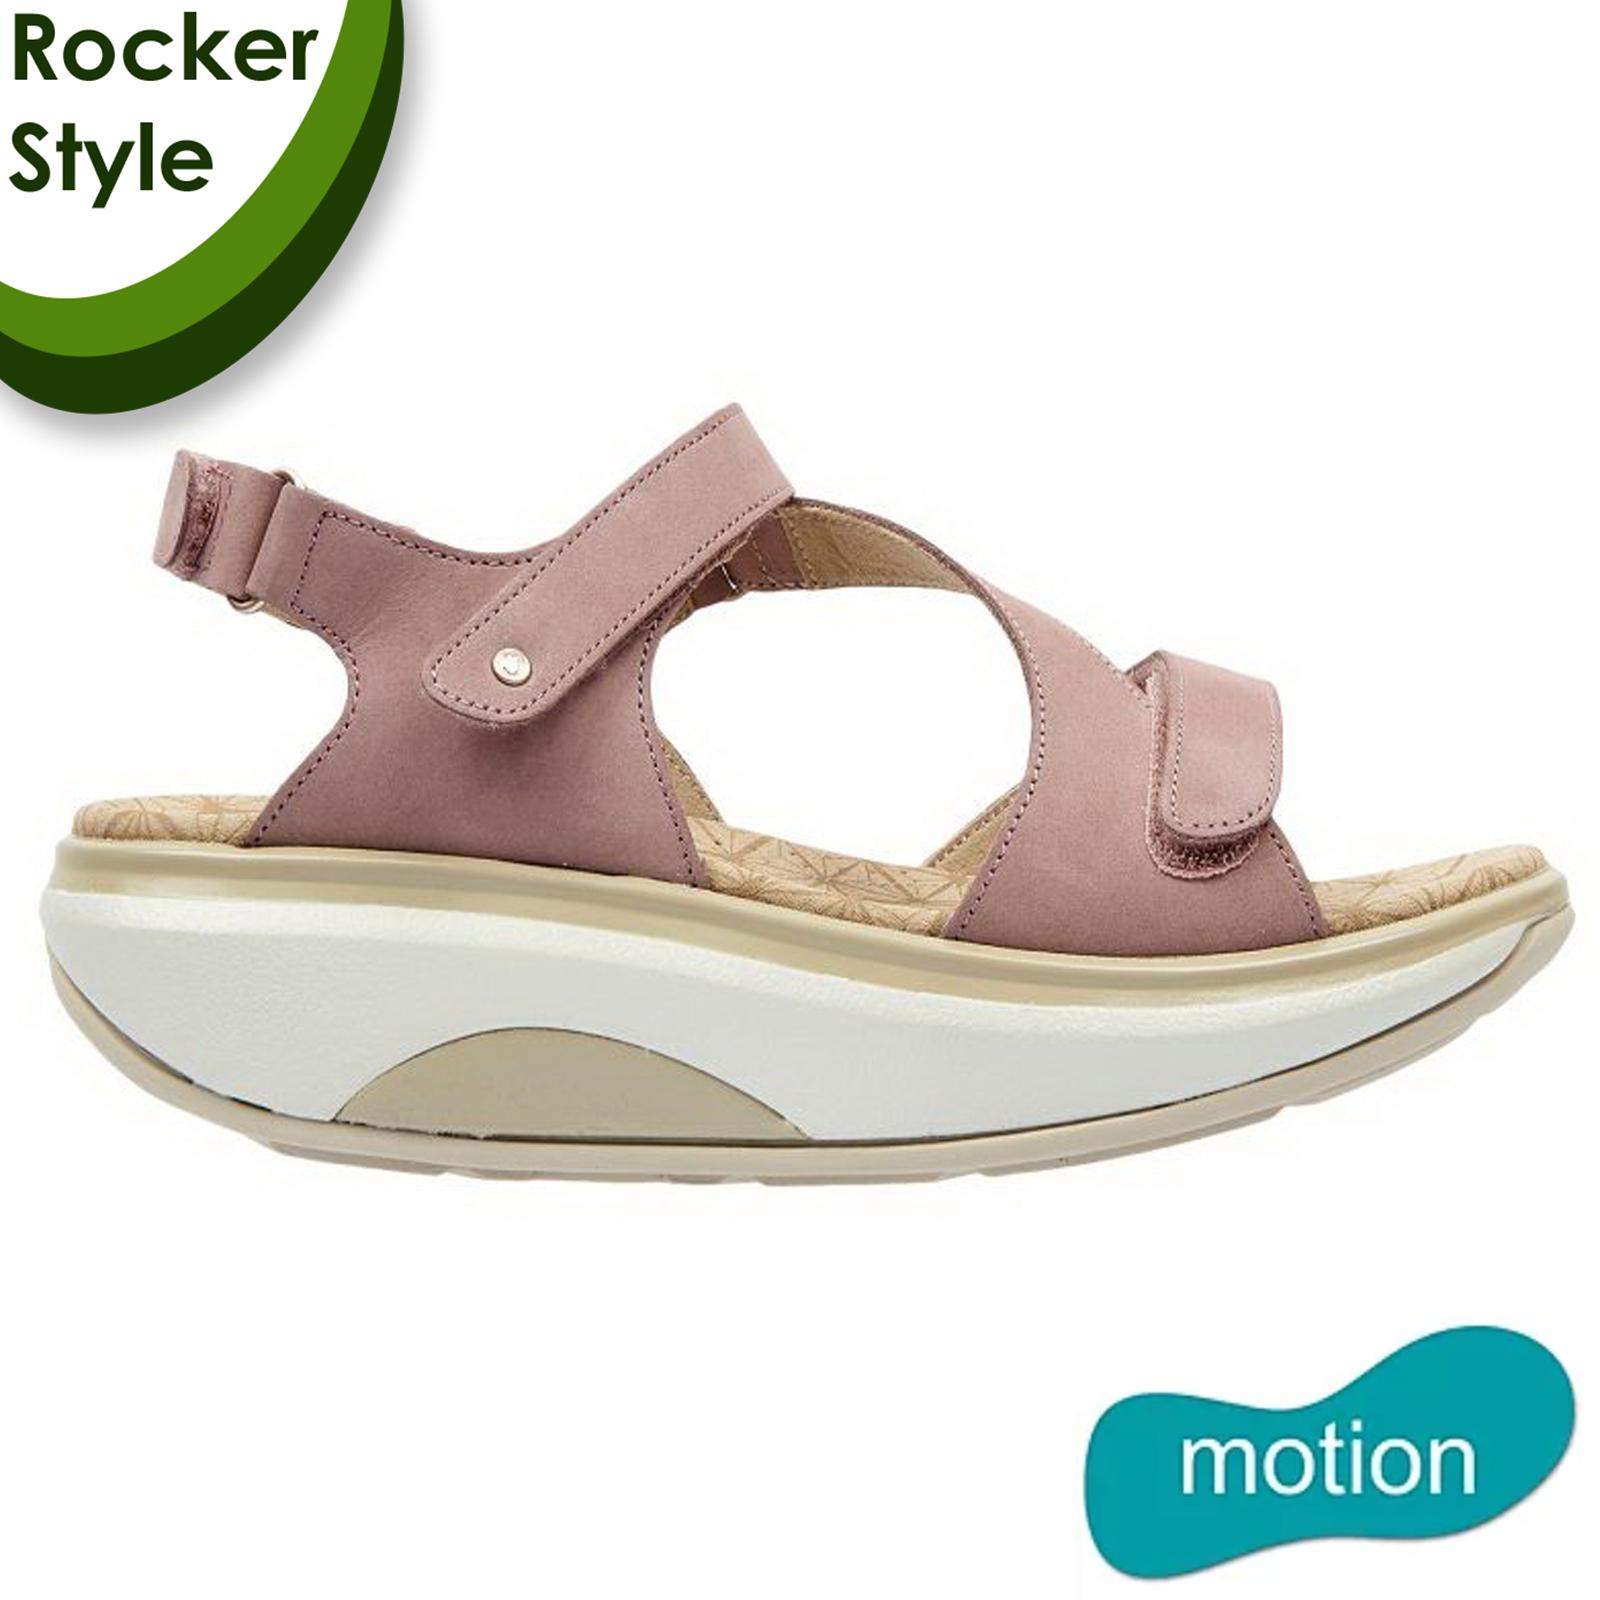 Joya Womens Jewel Leather Sandals - Pink